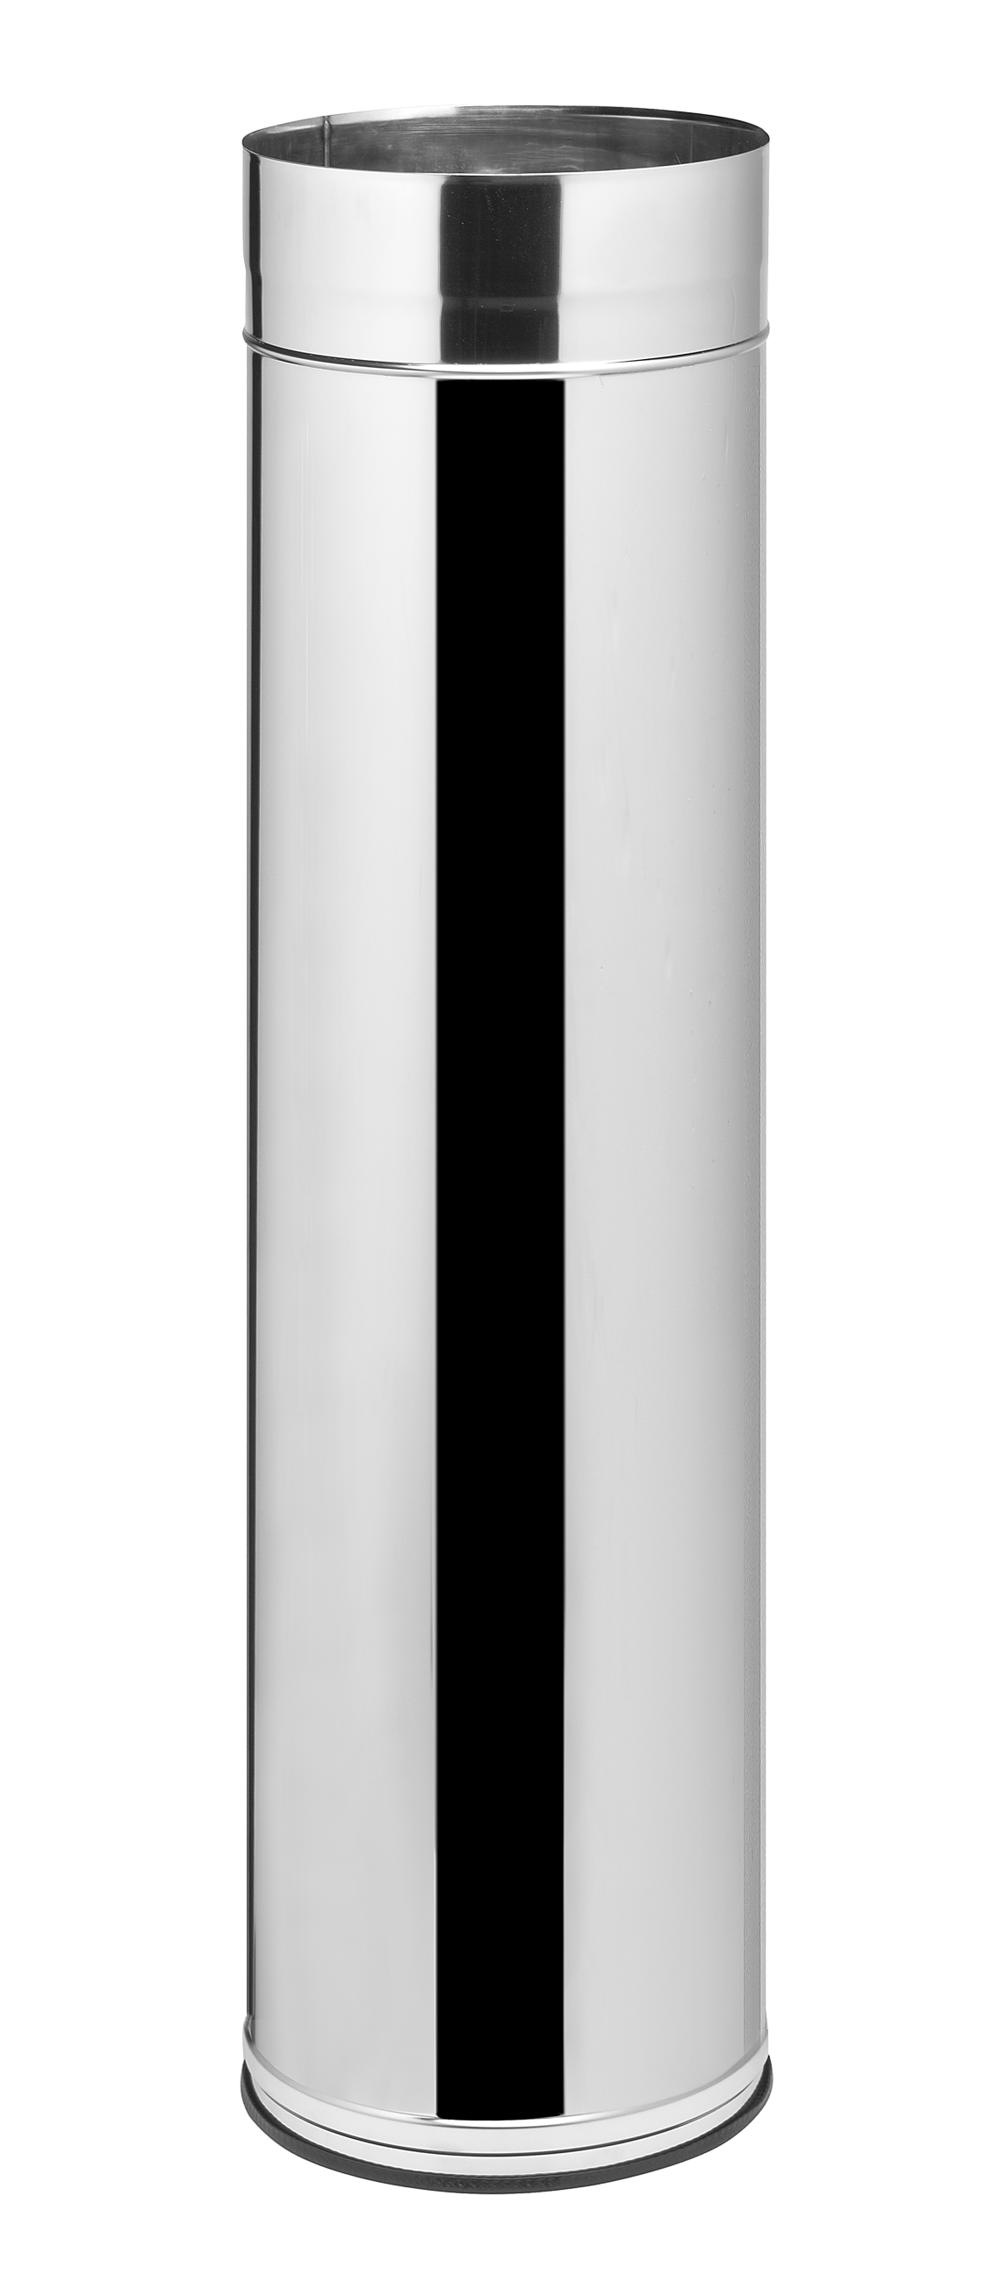 Finalrohr mit Kantenschutz Edelstahl Ø 300mm, 1000mm lang